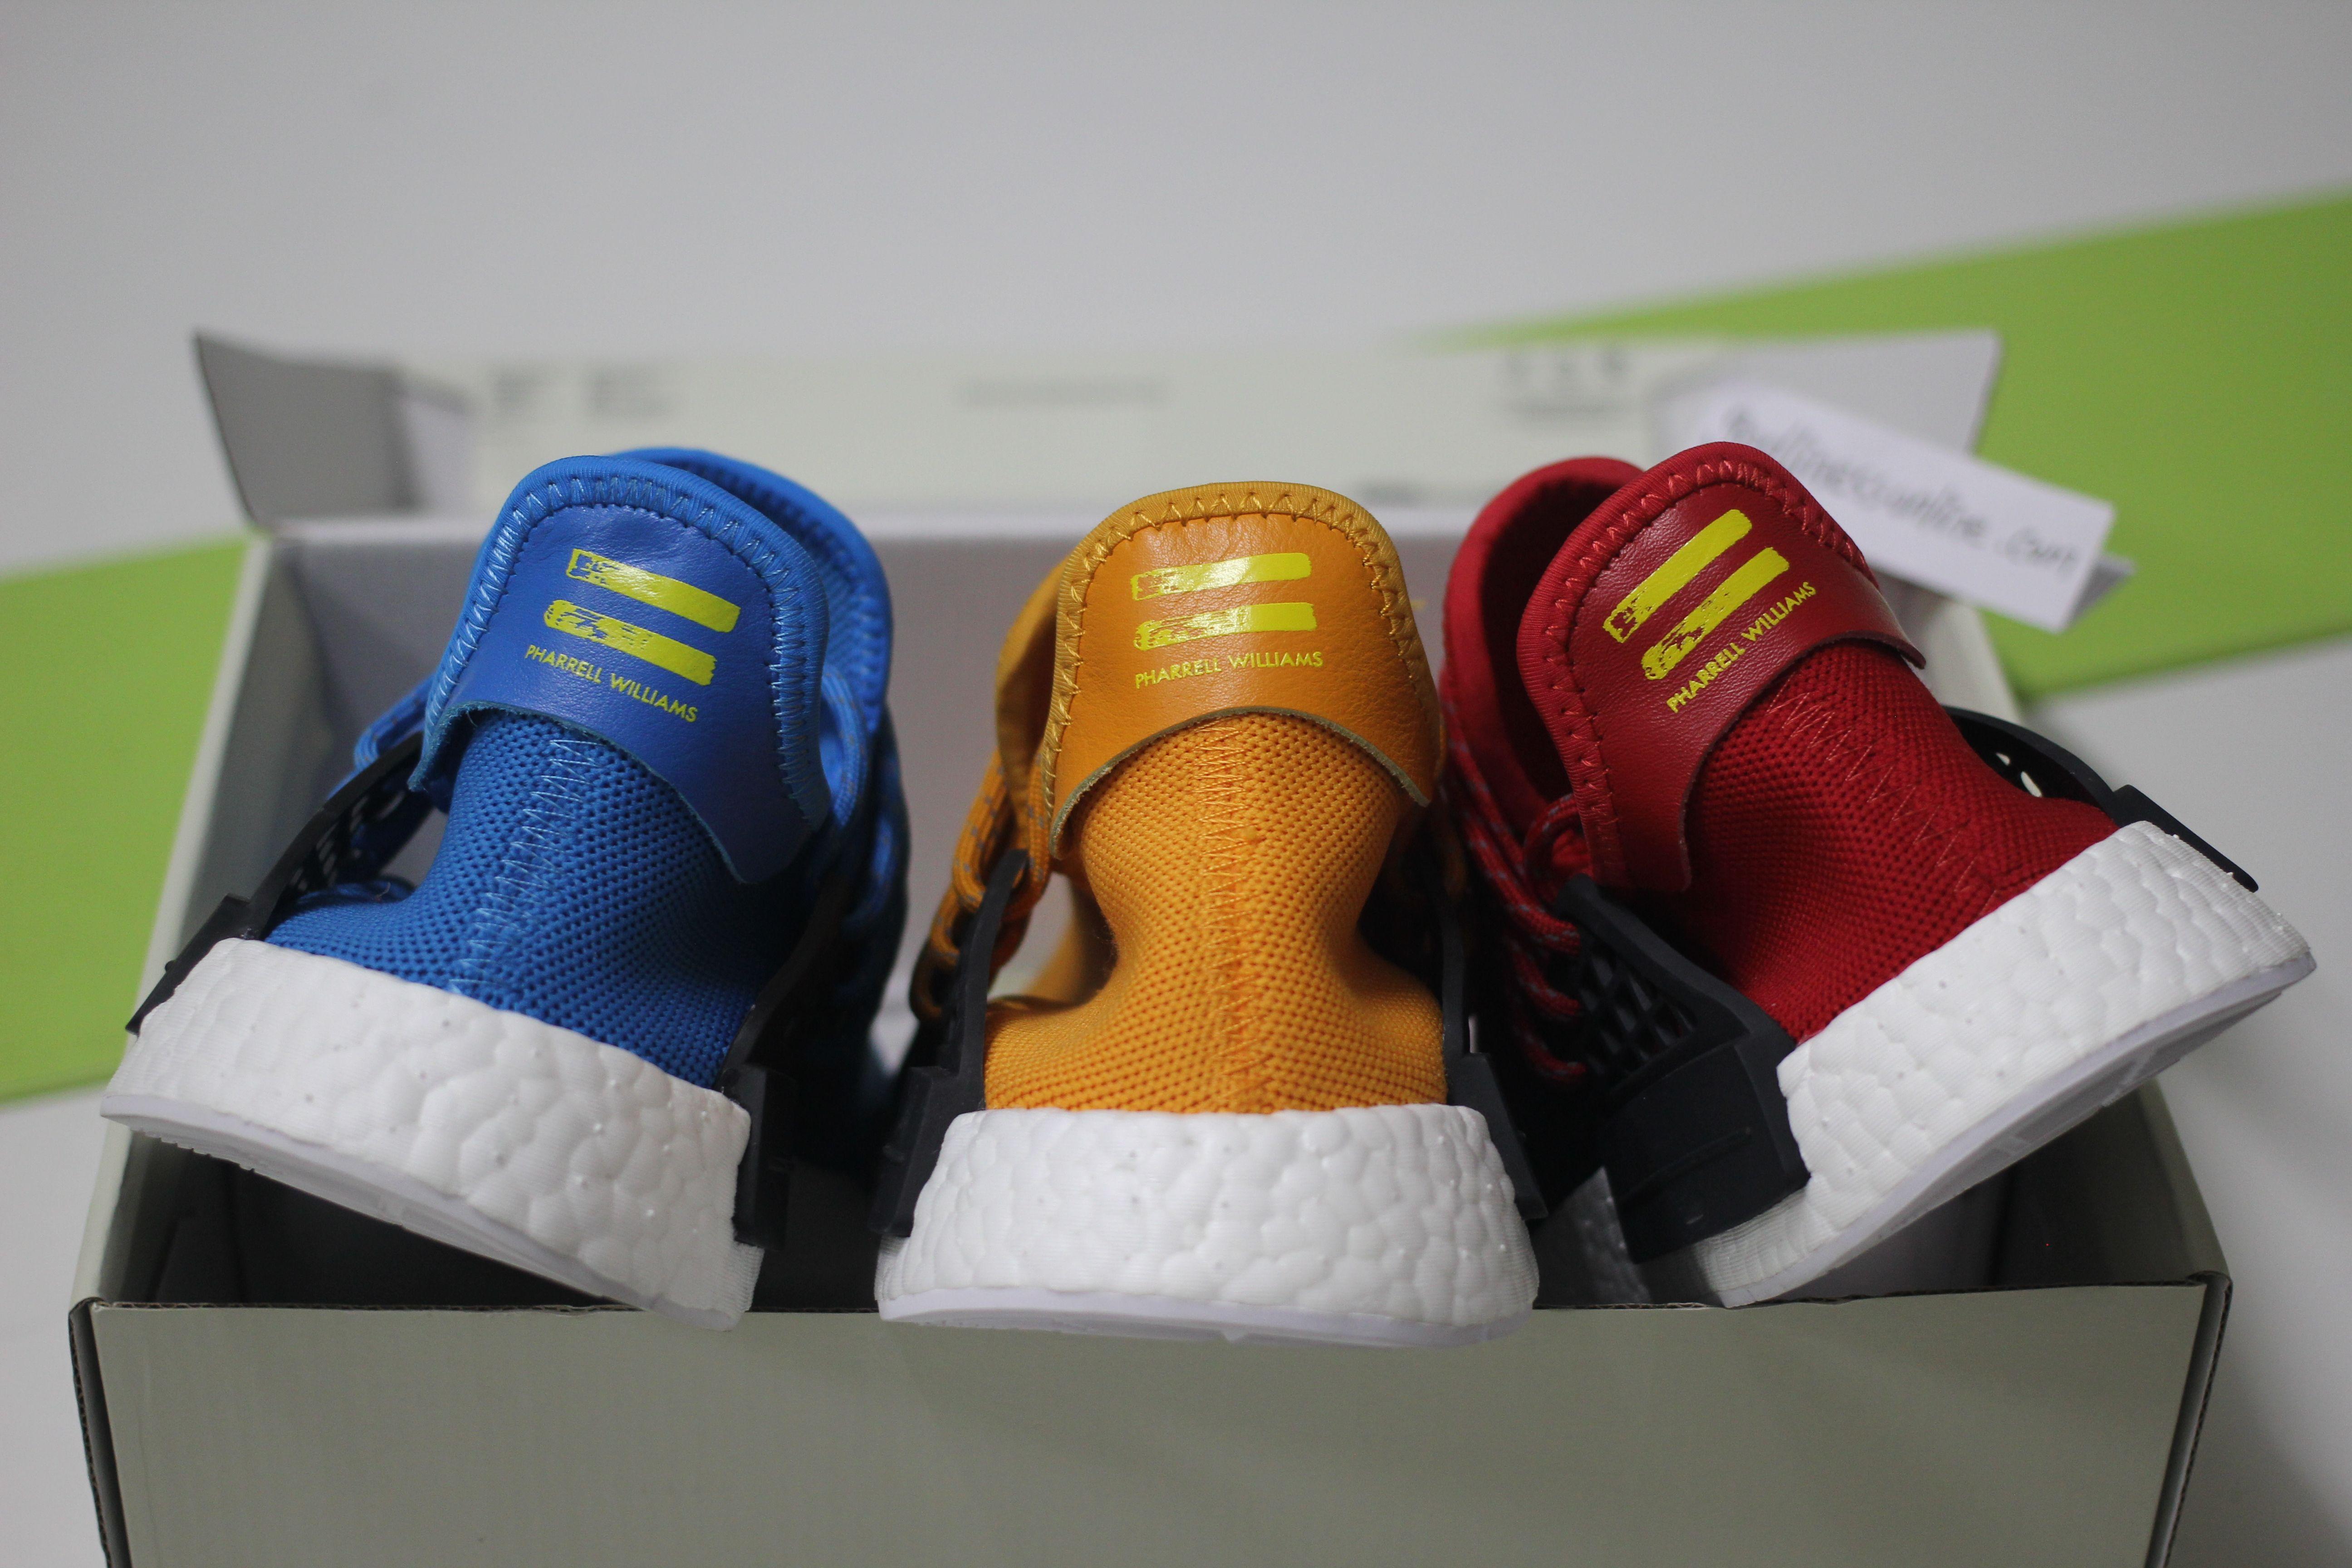 c59c9125d godlinssonline.com  PharrellWilliams  nicekicks  sneakers  menshoes  shoes   adidas  fashion  streetwear  fashionstreet  hypebeast  humanrace ...